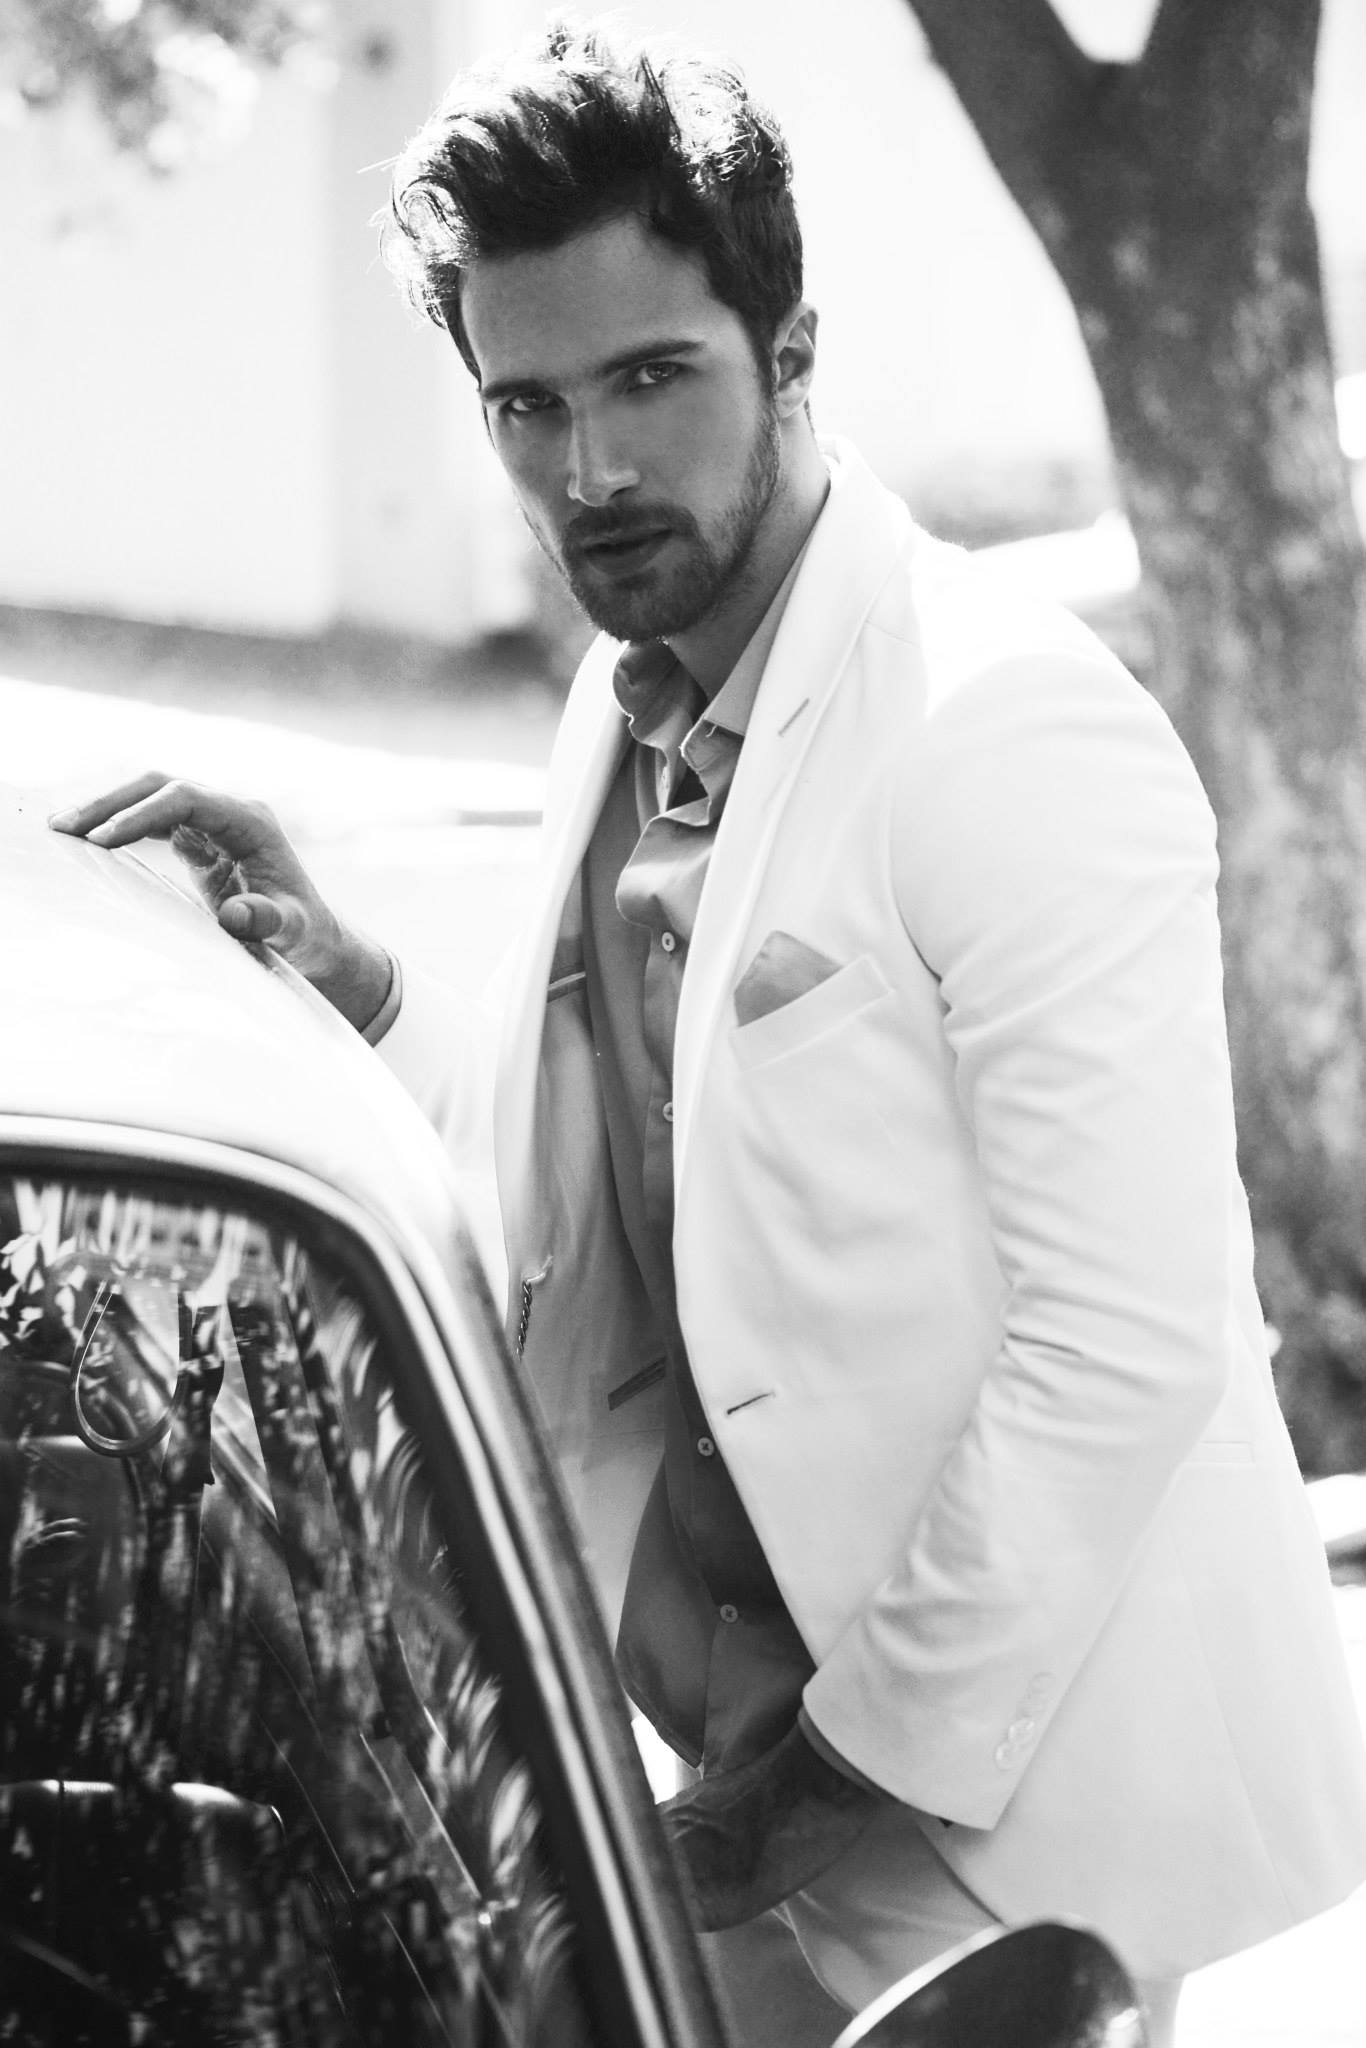 blog de moda masculina, moda masculina, menswear, estilo, style, moda sem censura, alex cursino, rodrigo marconatto, Antonio Bevilacqua, editorial de moda, modelo, way model, 8